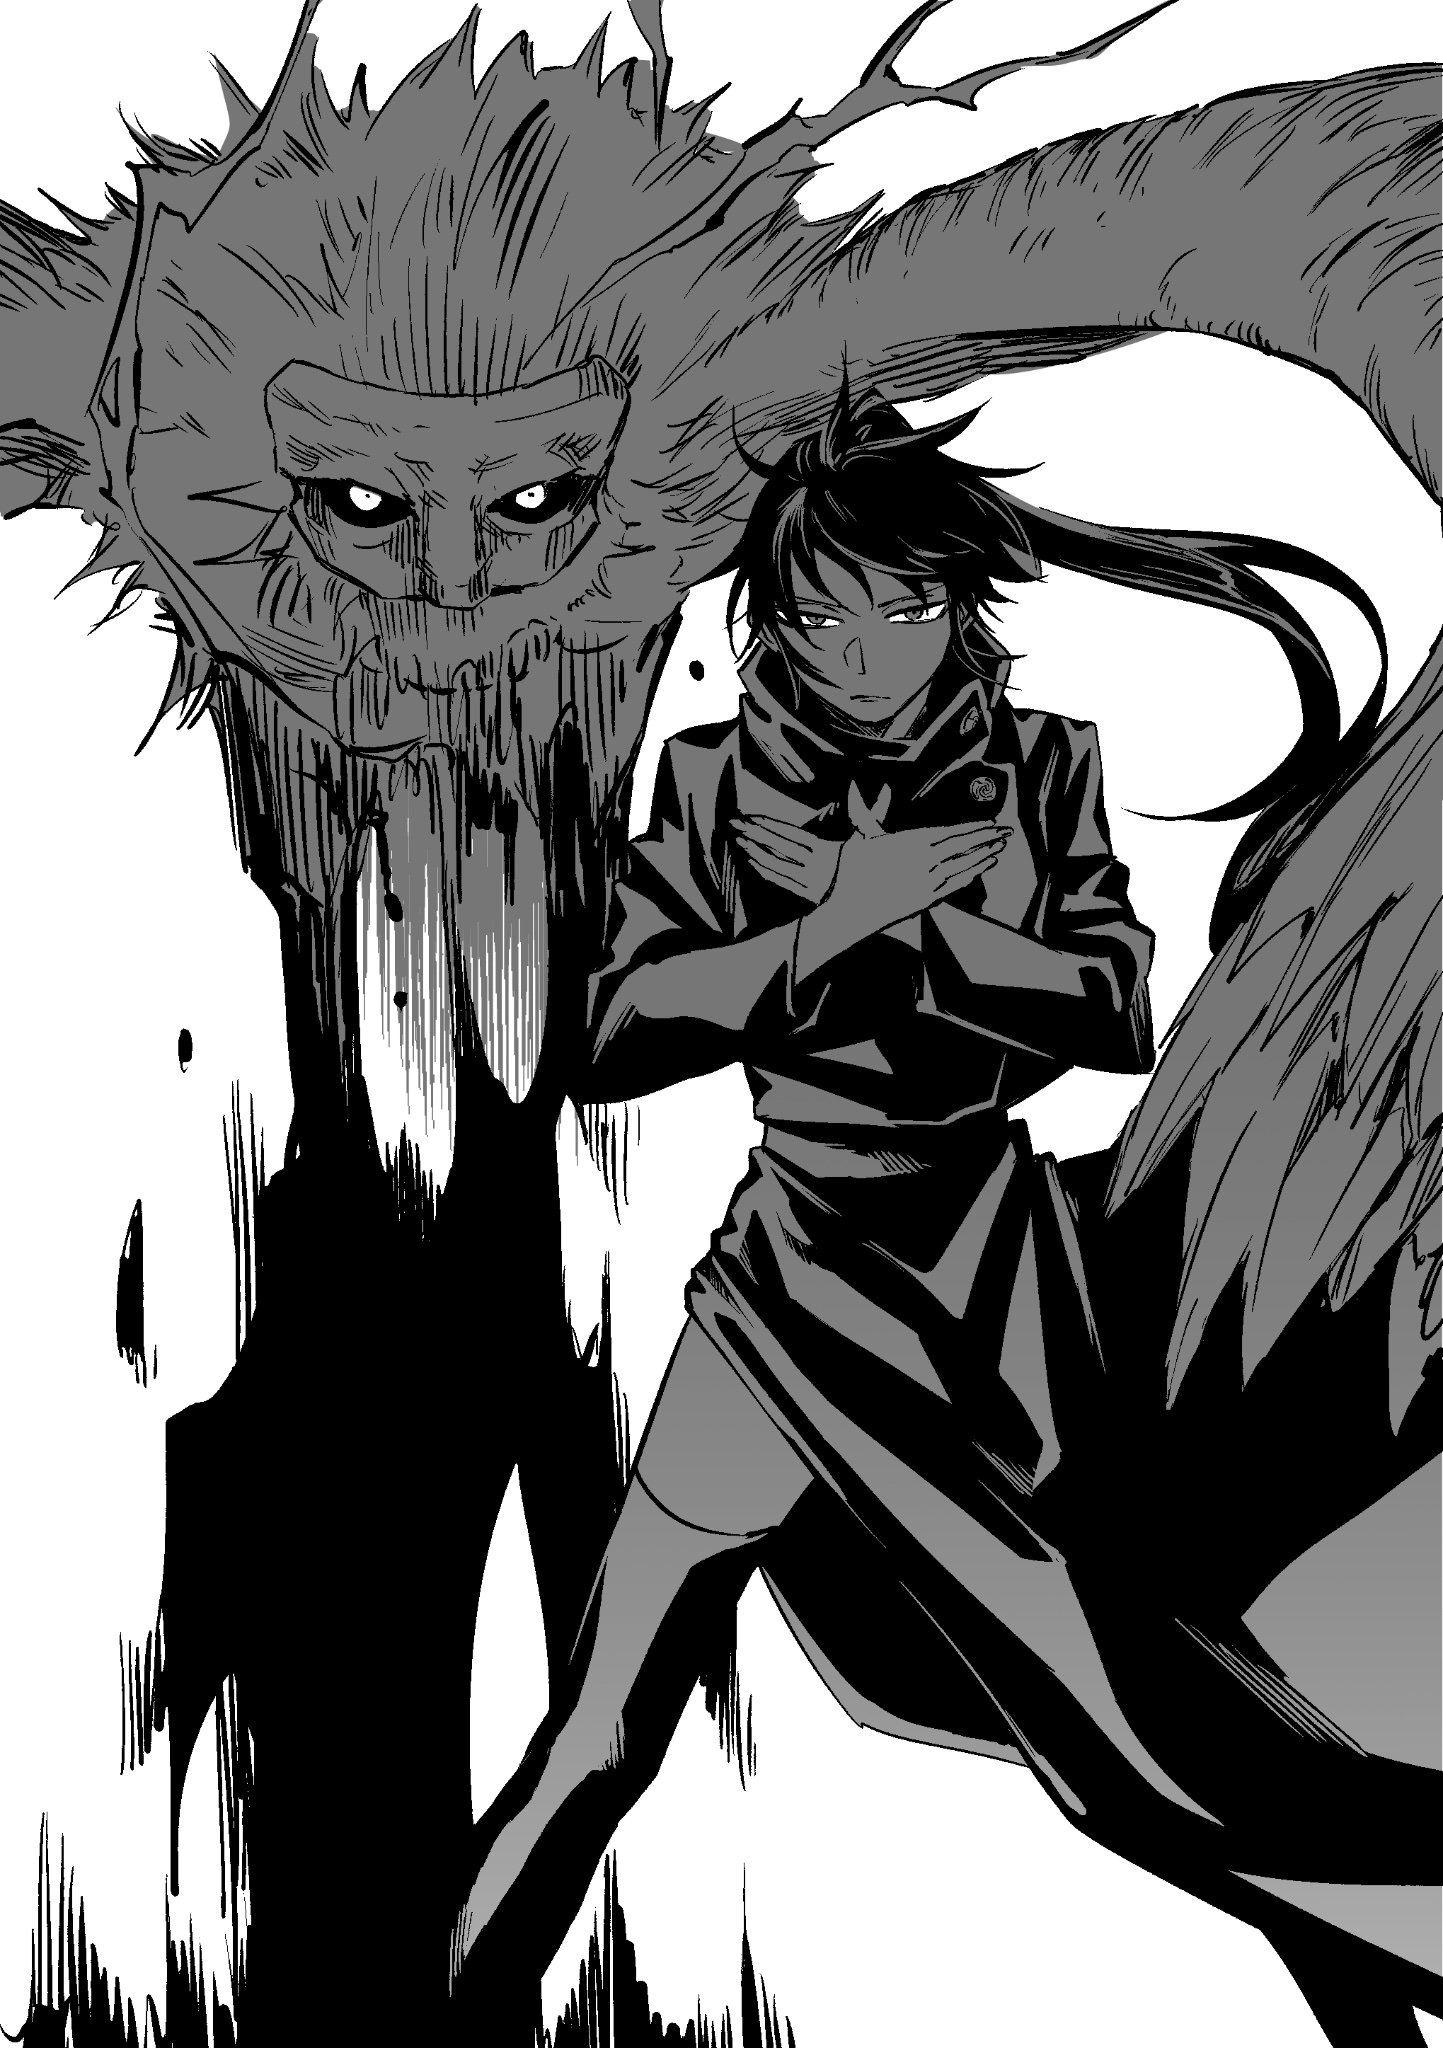 永流☀ on Twitter in 2020 Jujutsu, 2d art, Manga art